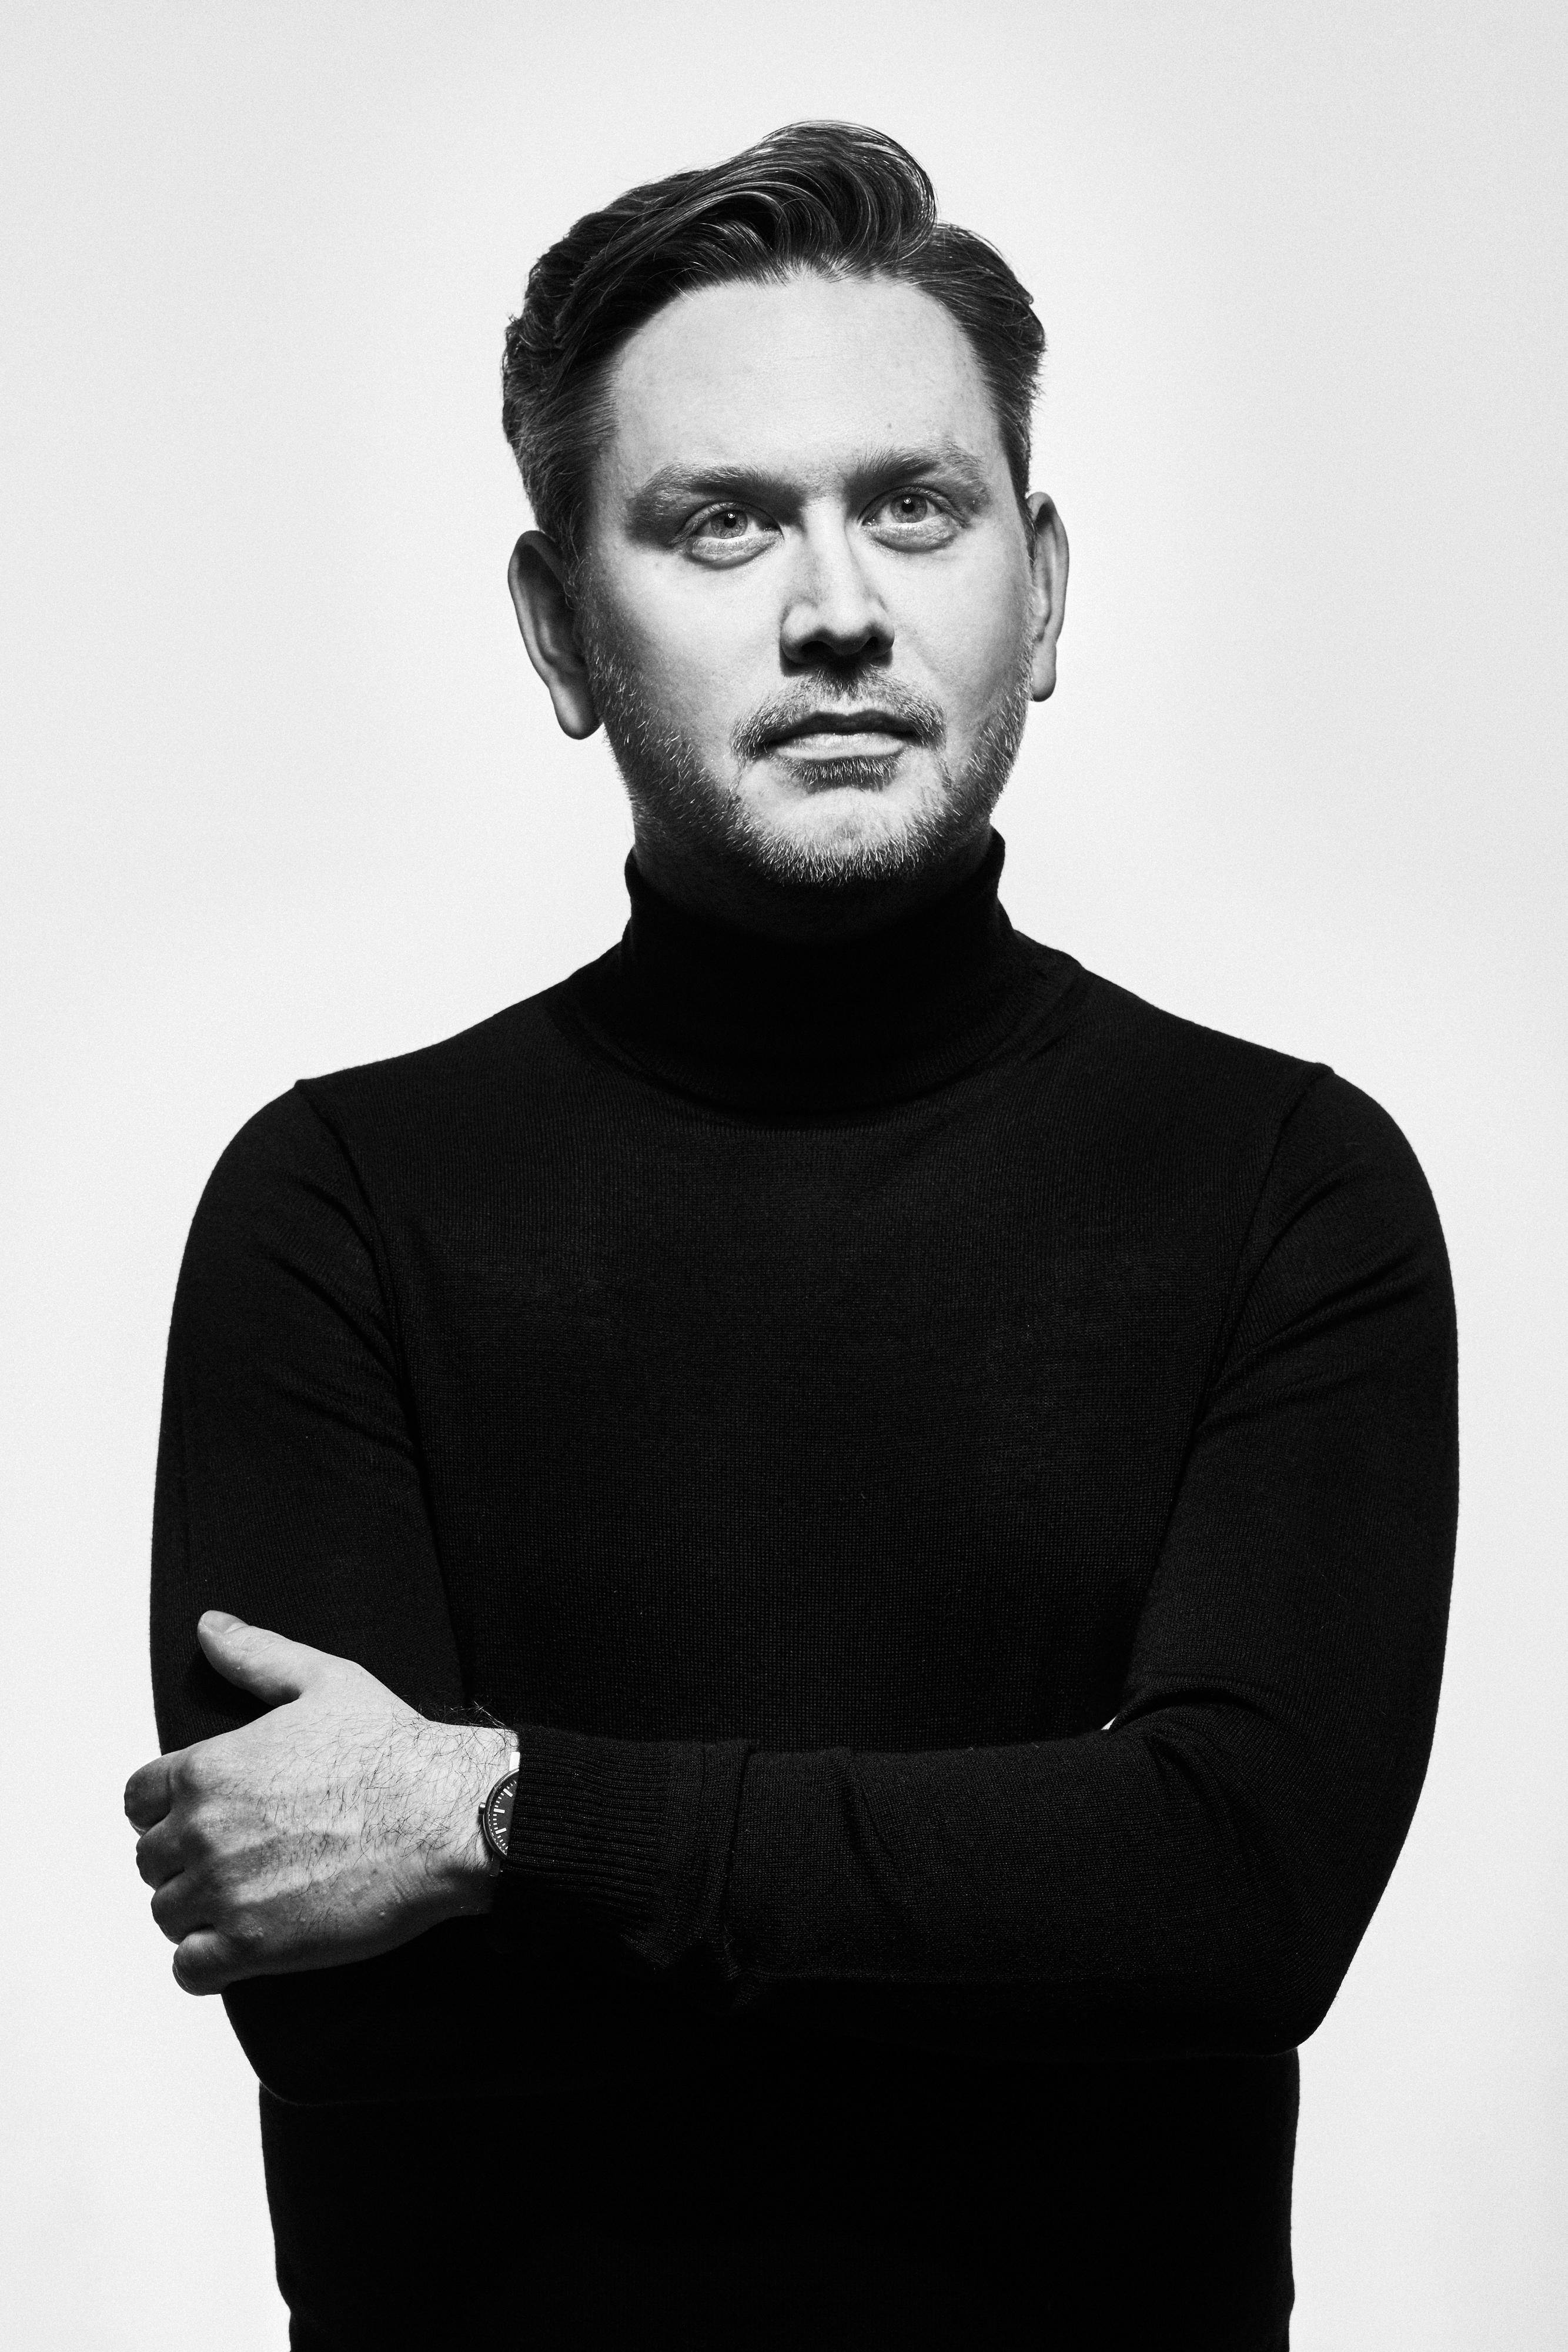 Jonathan Bloxham